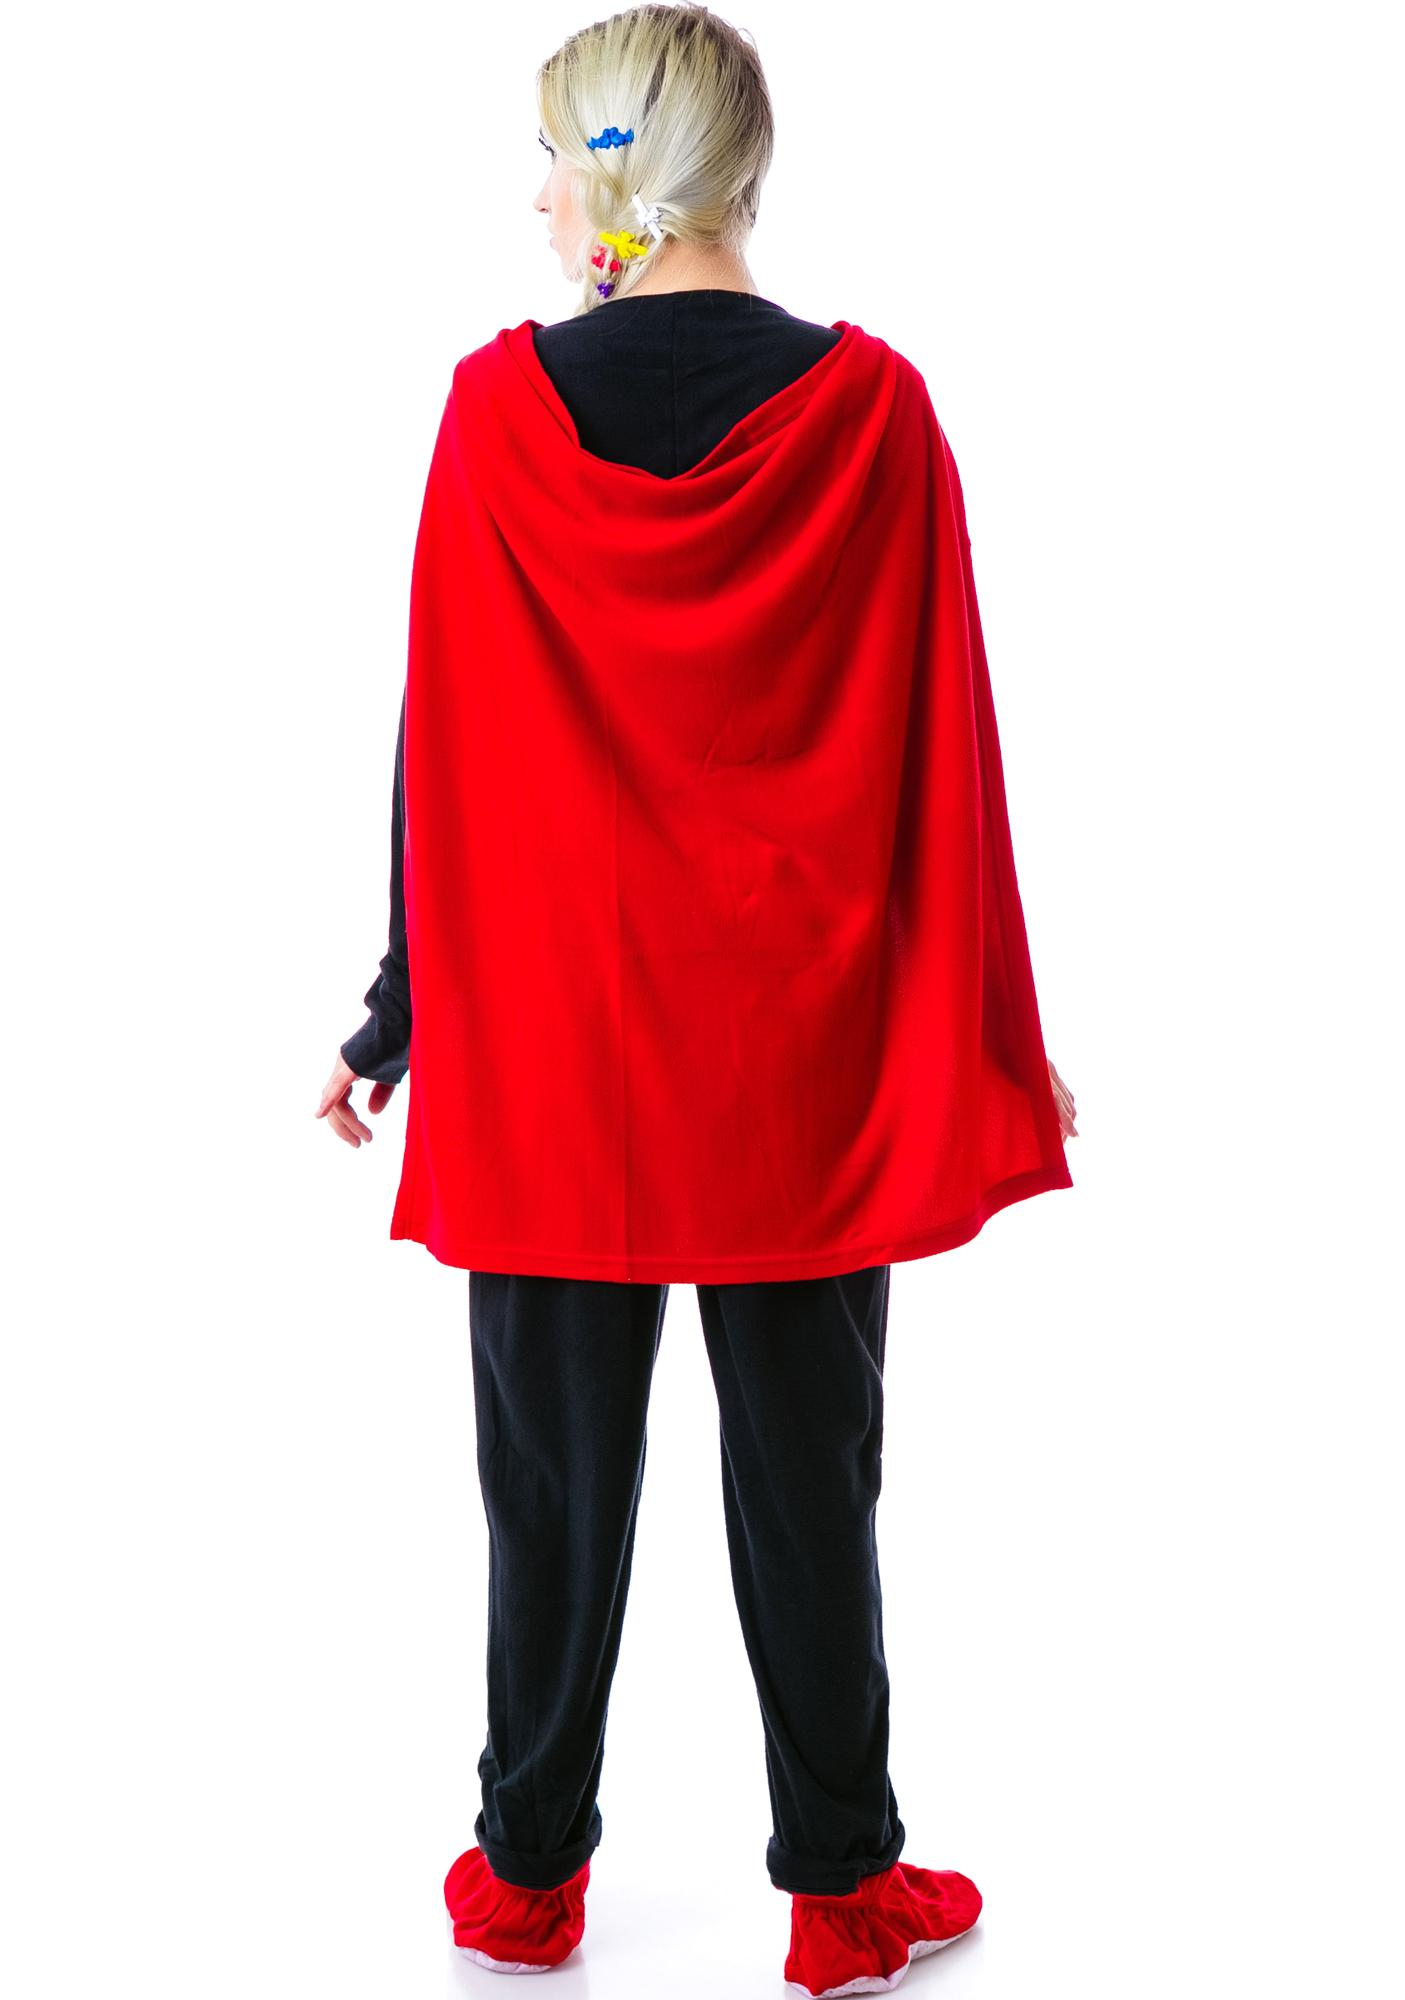 Undergirl Man of Steel Onesie